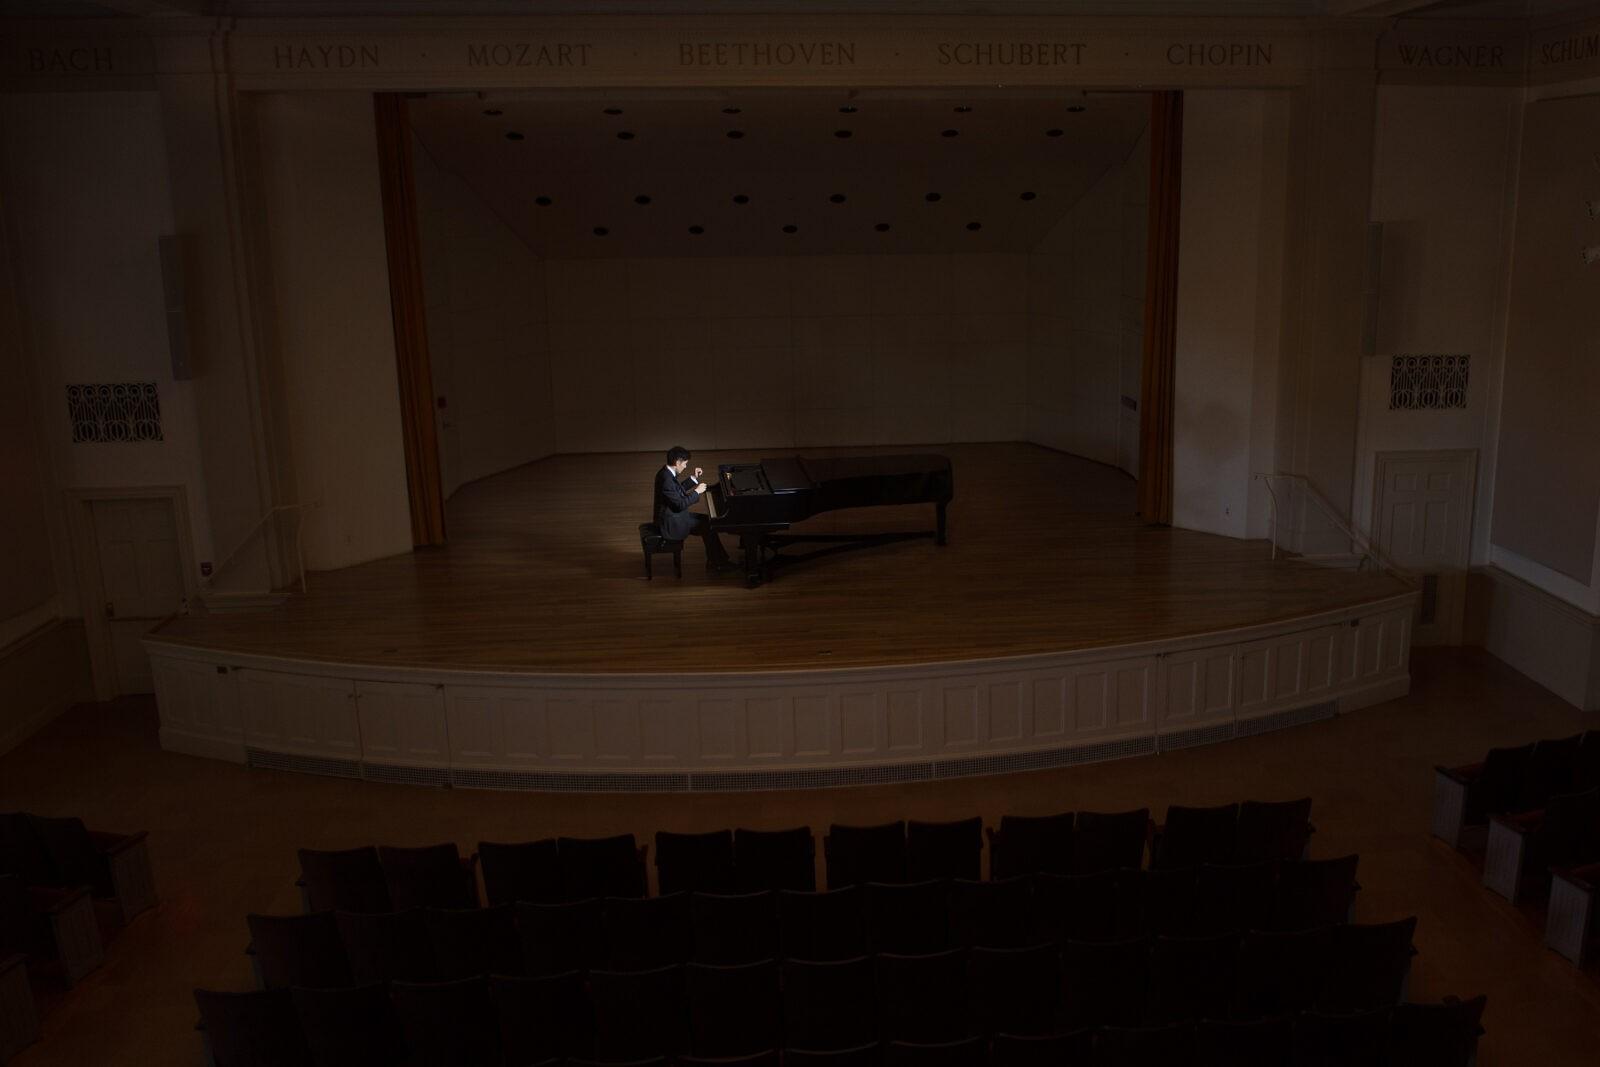 harvard musician